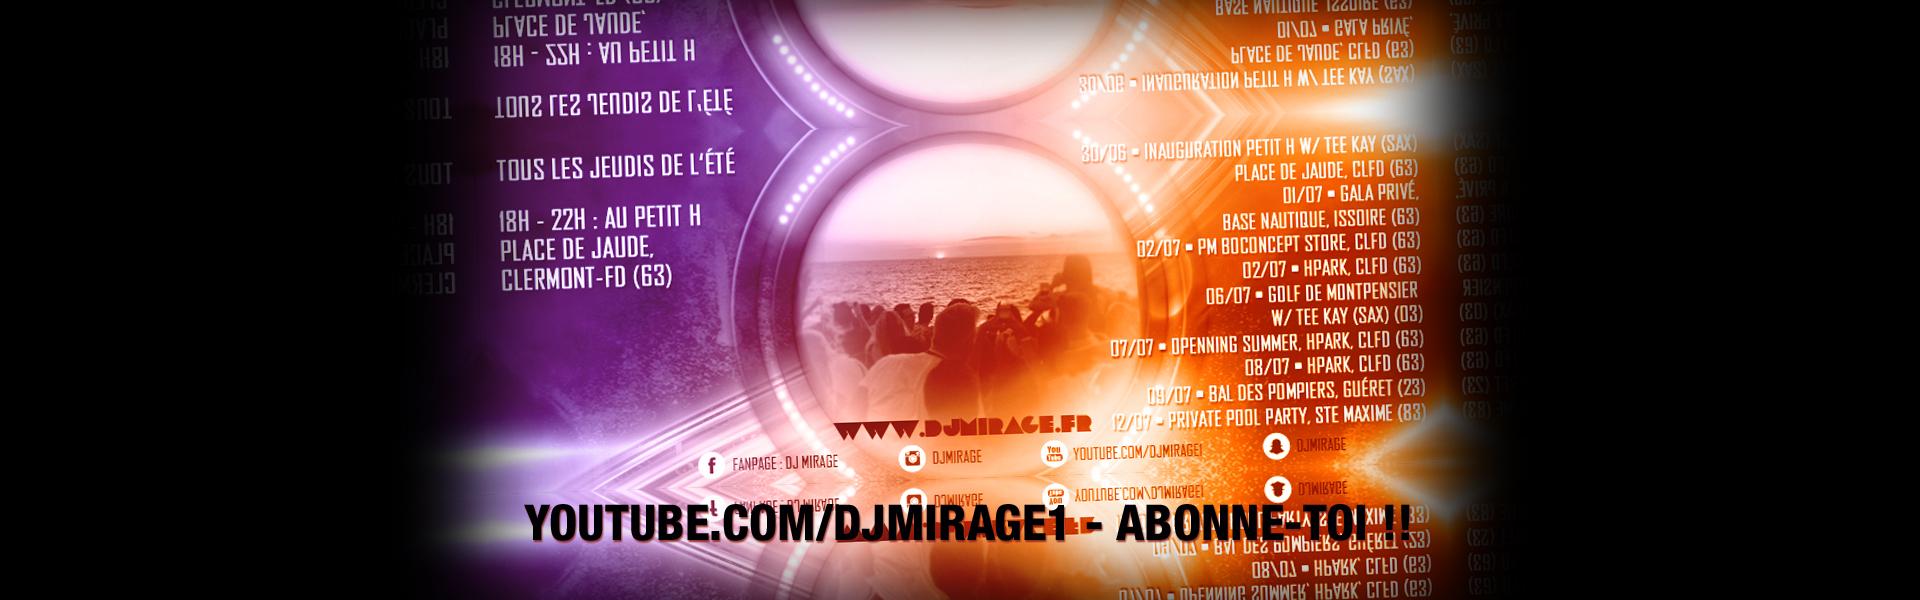 http://djmirage.fr/wp-content/uploads/2016/10/slider-accueil-deejaymirage-juill16.jpg